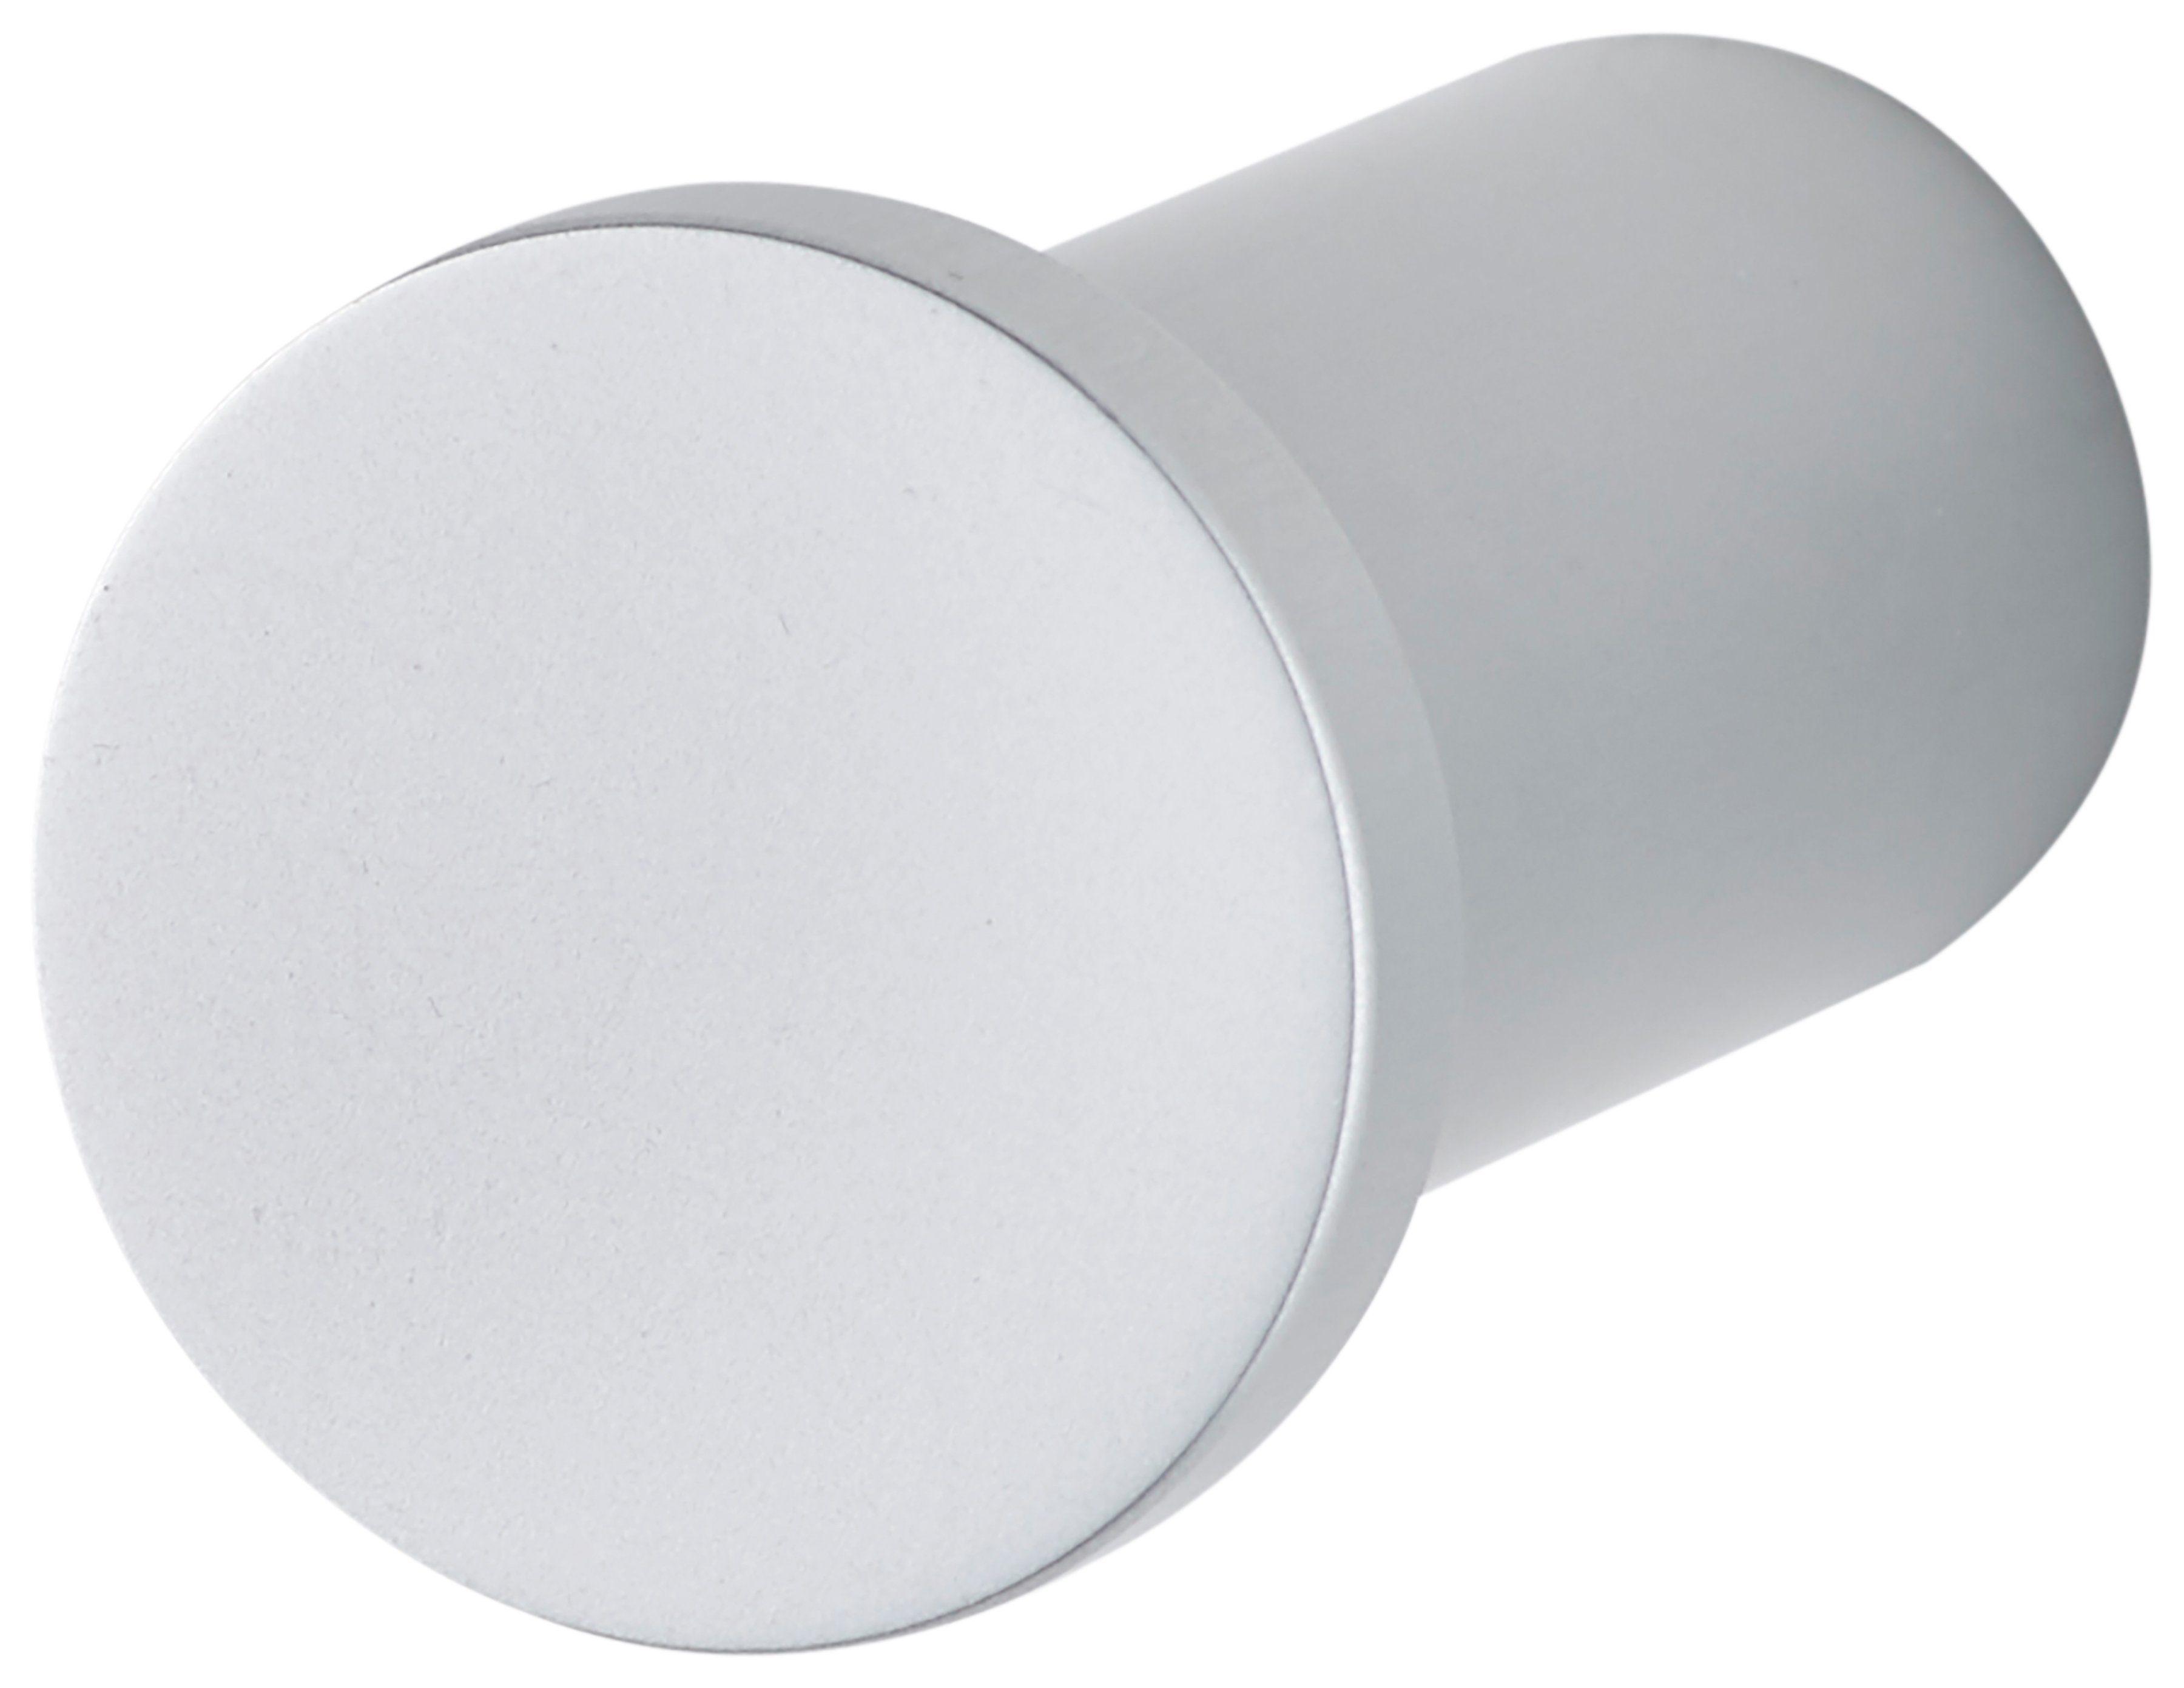 KEUCO Handtuch-Haken »Plan«, Aluminium silber-eloxiert, Ø 21 mm